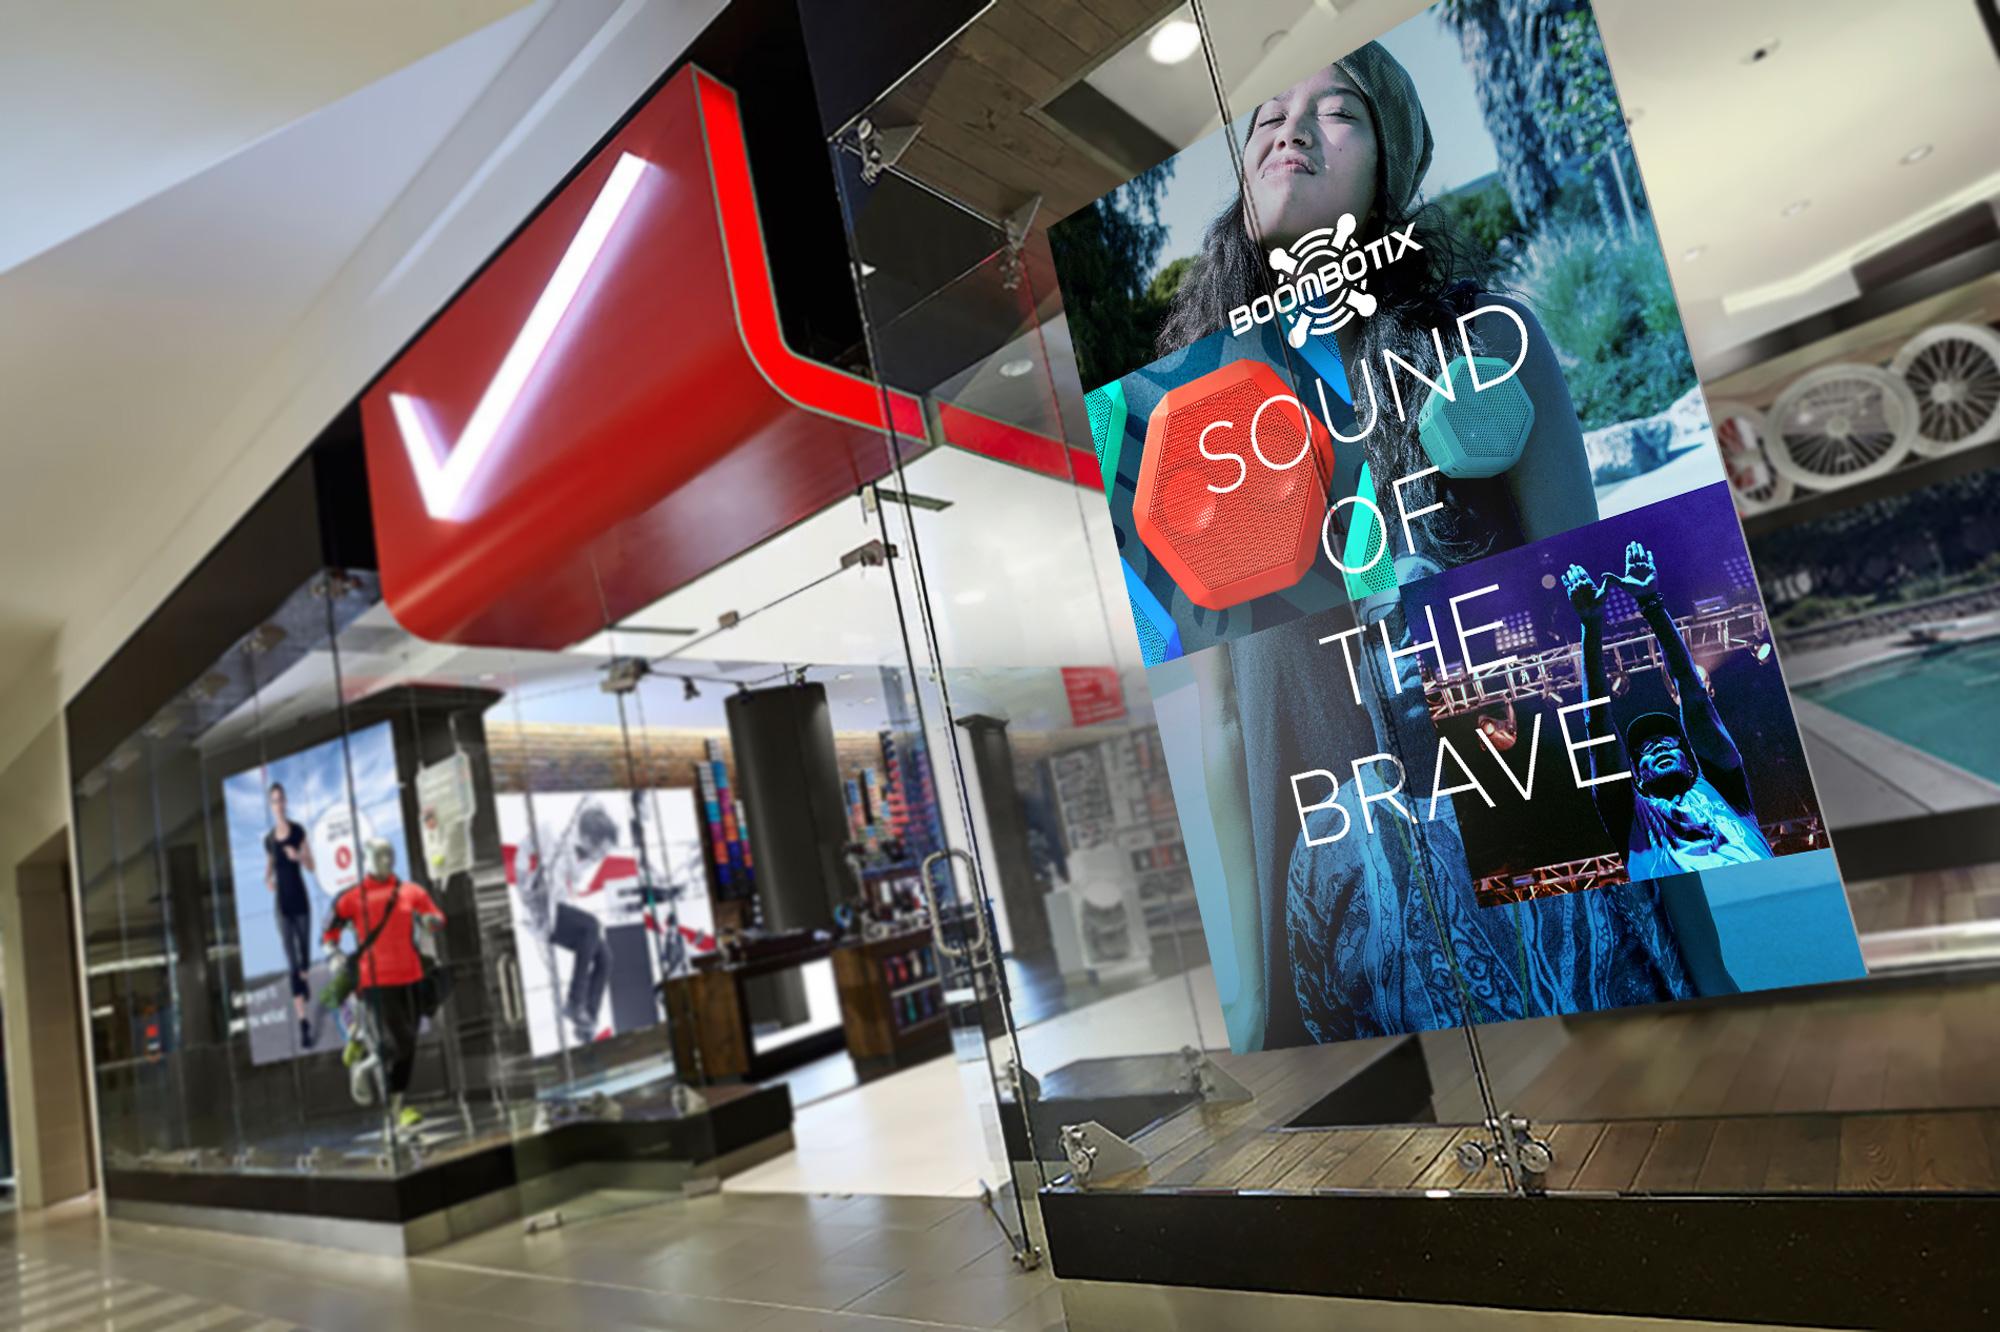 Boombotix retail display advertisement with various imagery of people enjoying music